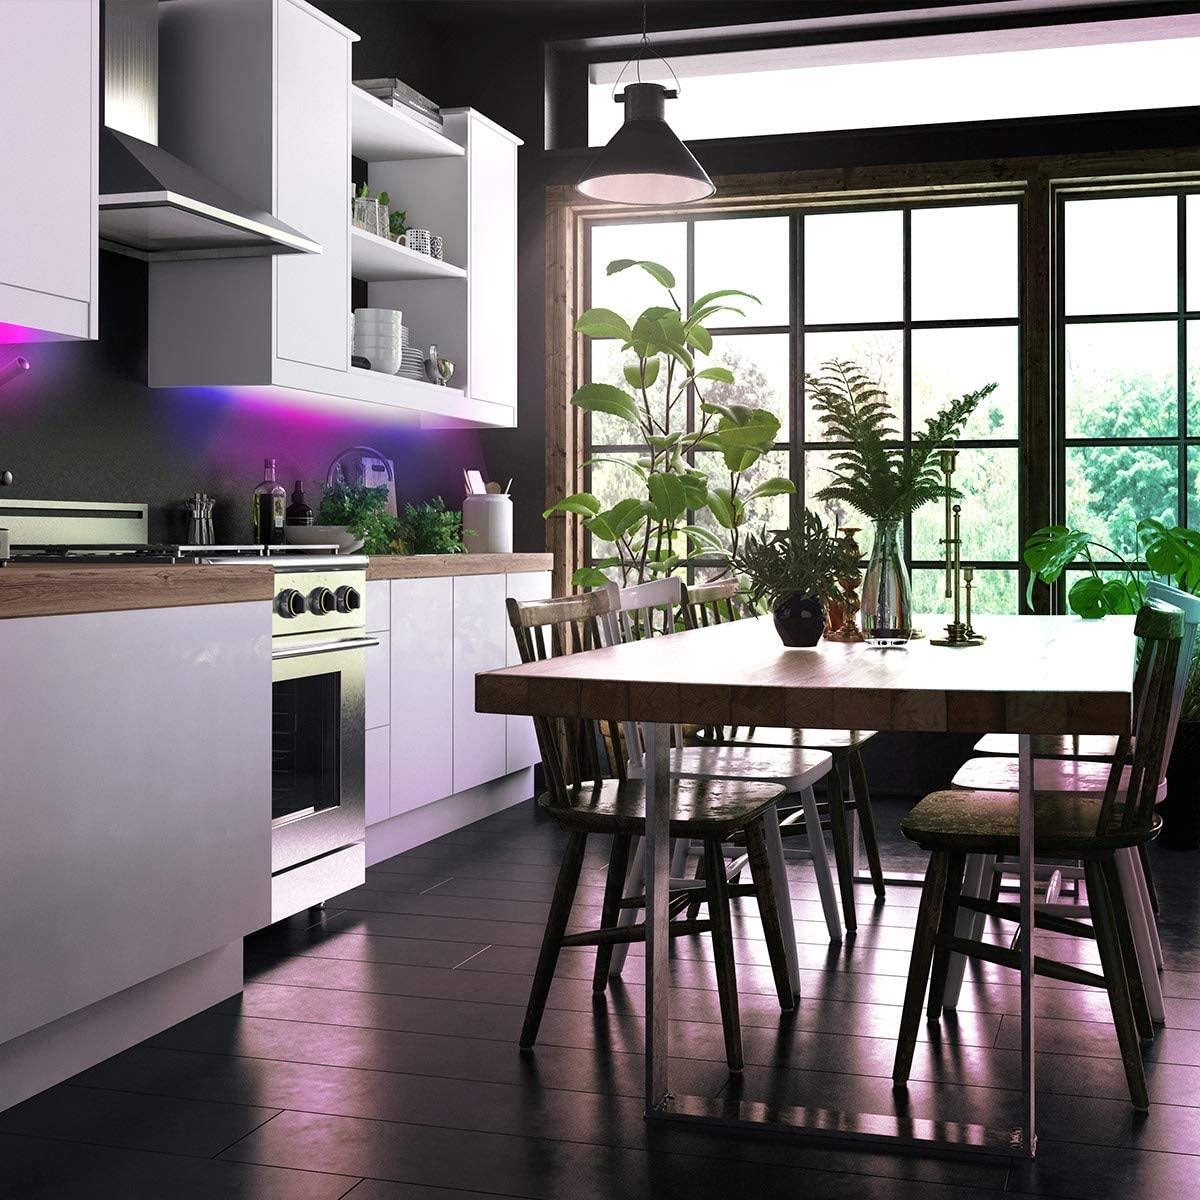 LIFX Z Smart LED Light Strip Extension Kit 3.3′